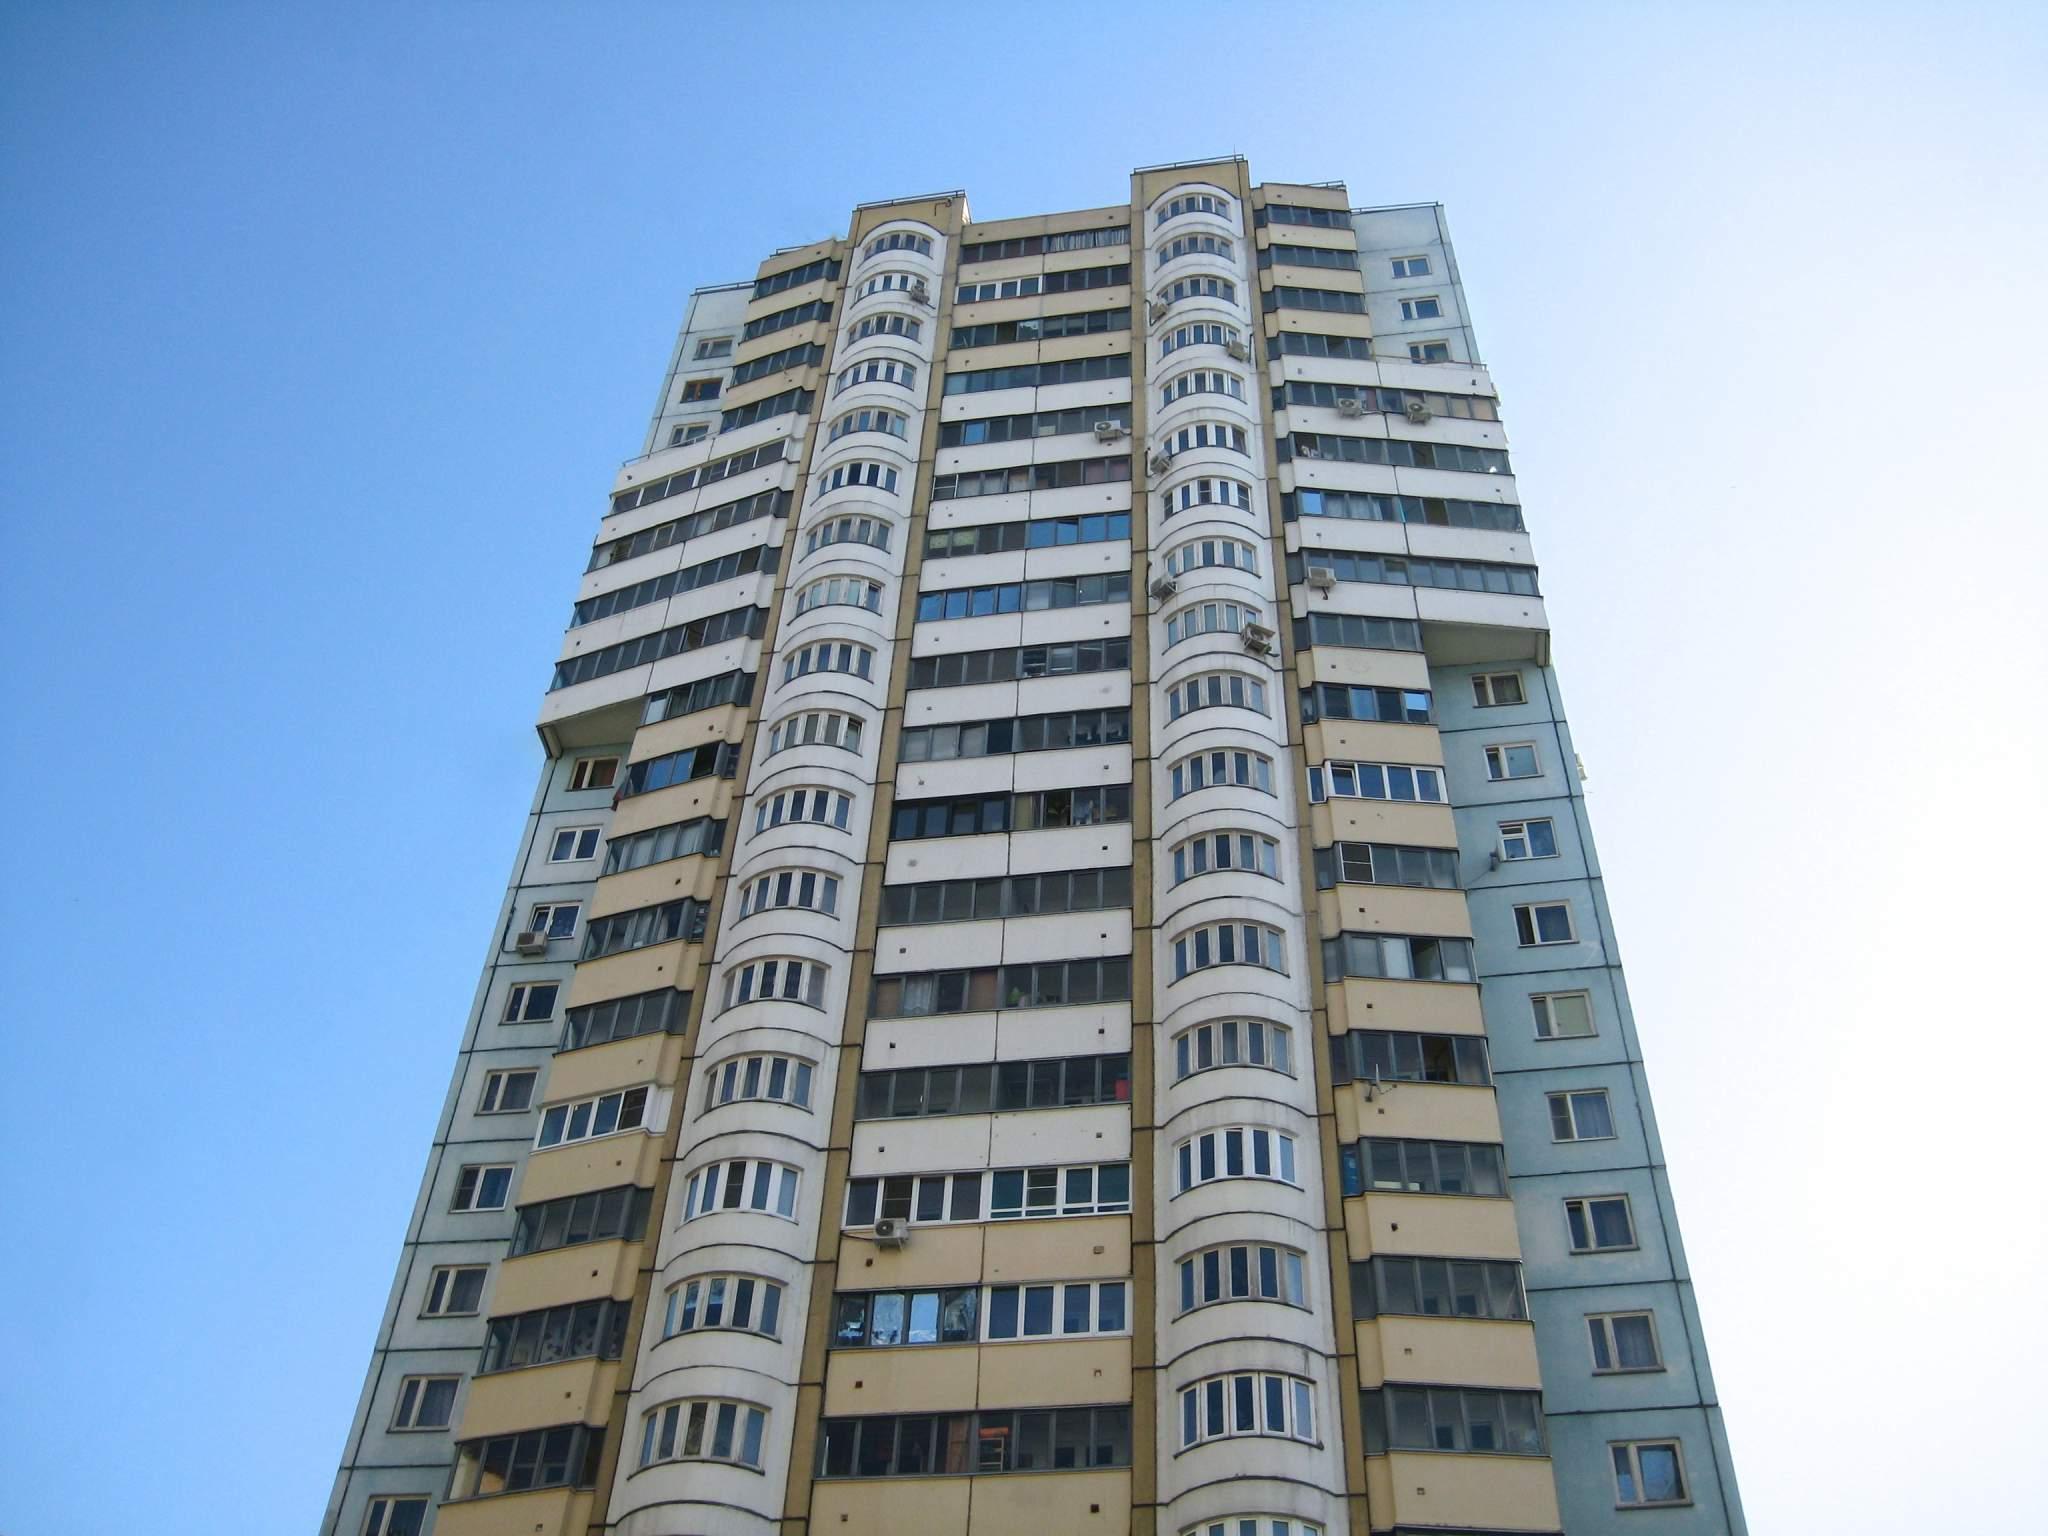 Балкон дома серии 155. - мои статьи - каталог статей - утепл.